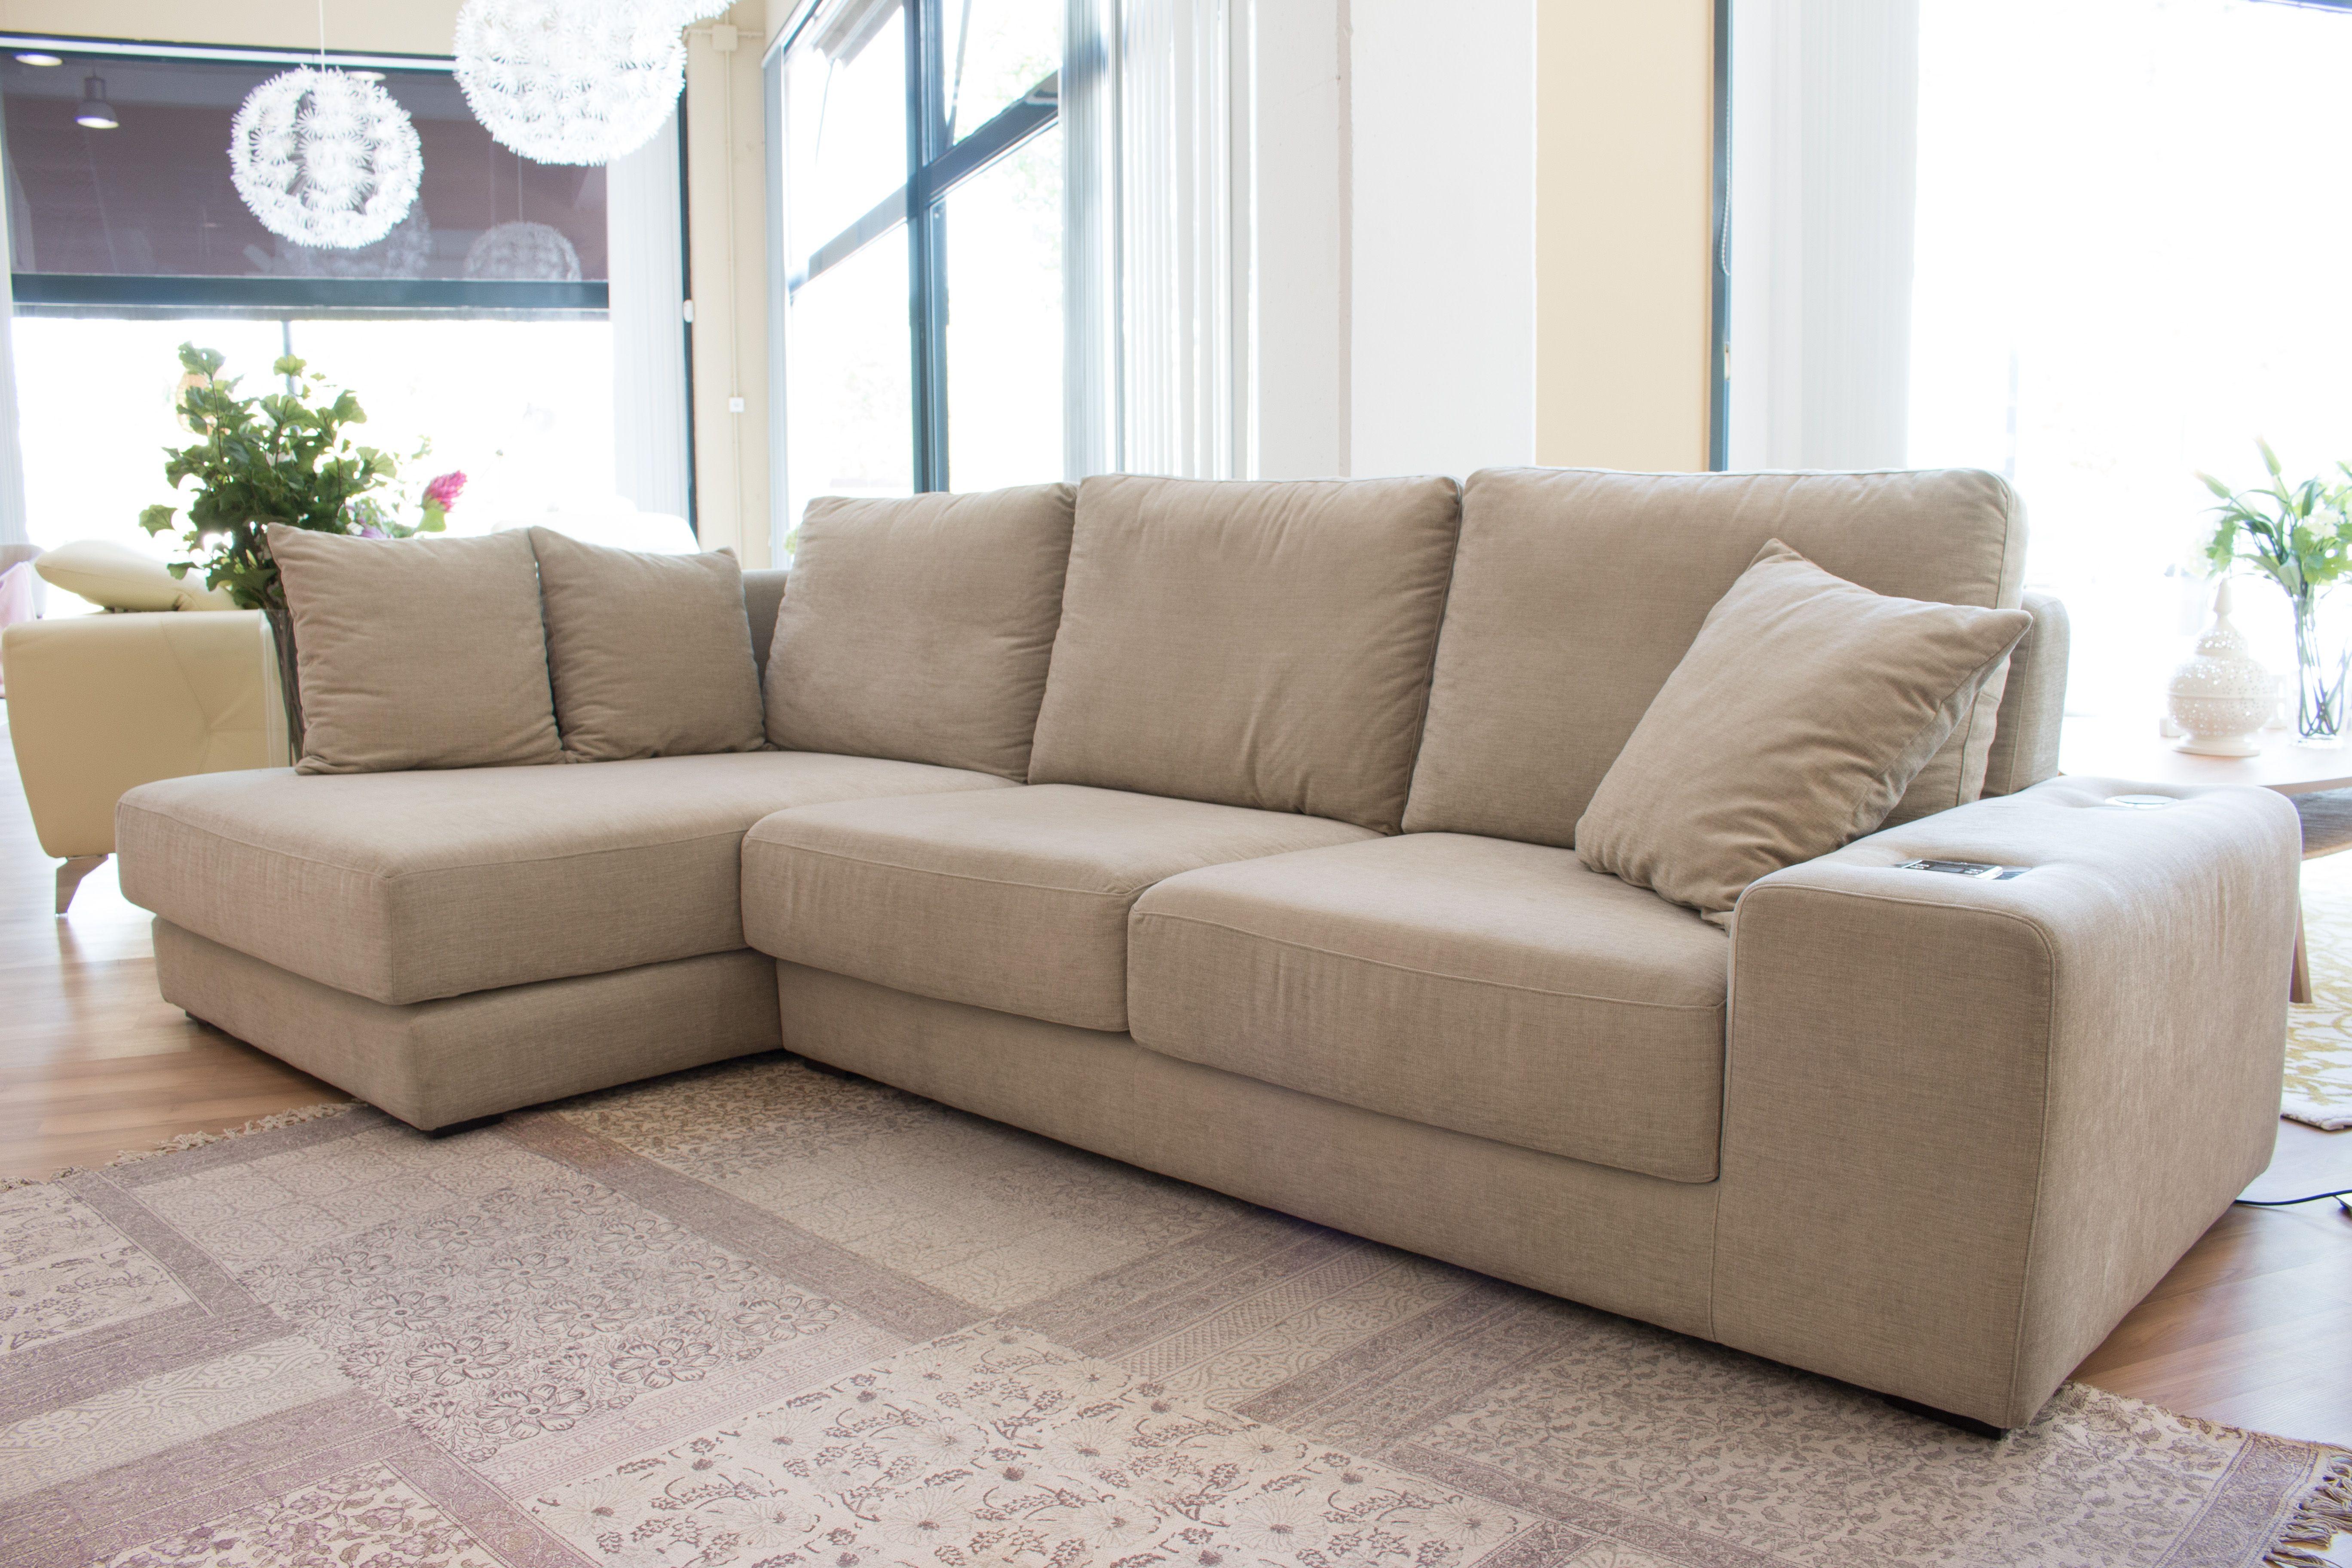 Http Karannesofas Es Blog 18_estilos De Sofa Para Decorar Tu  # Muebles Liquidacion Manacor